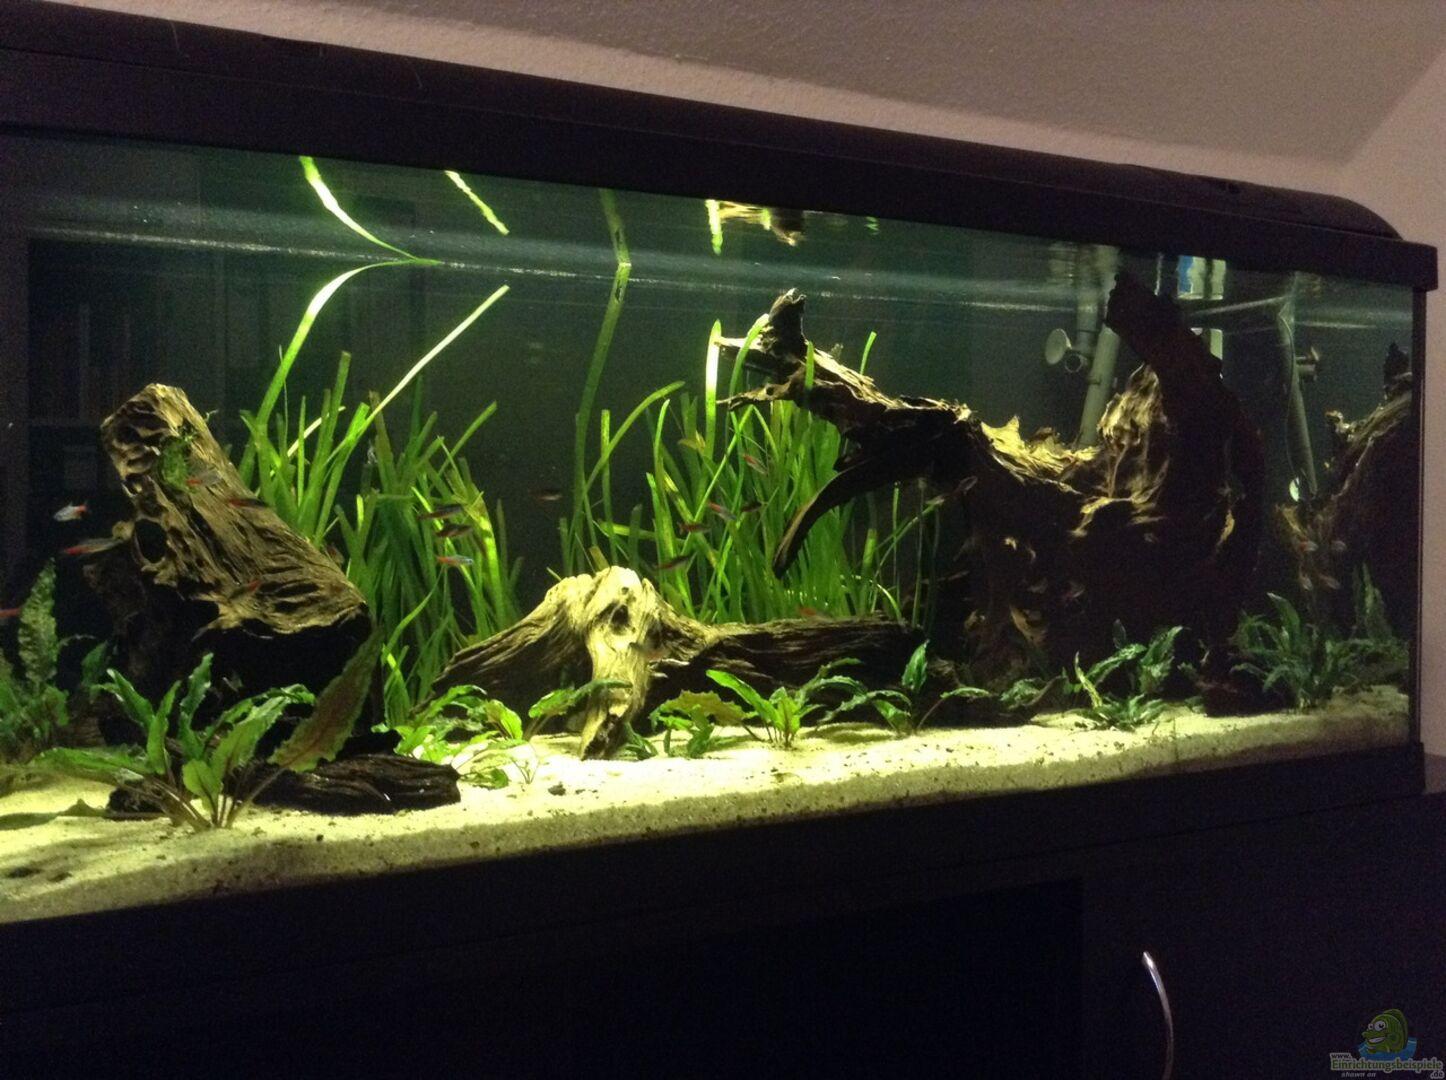 Simon w 33022 wurzel biotop ohne heizung for Aquarium heizung